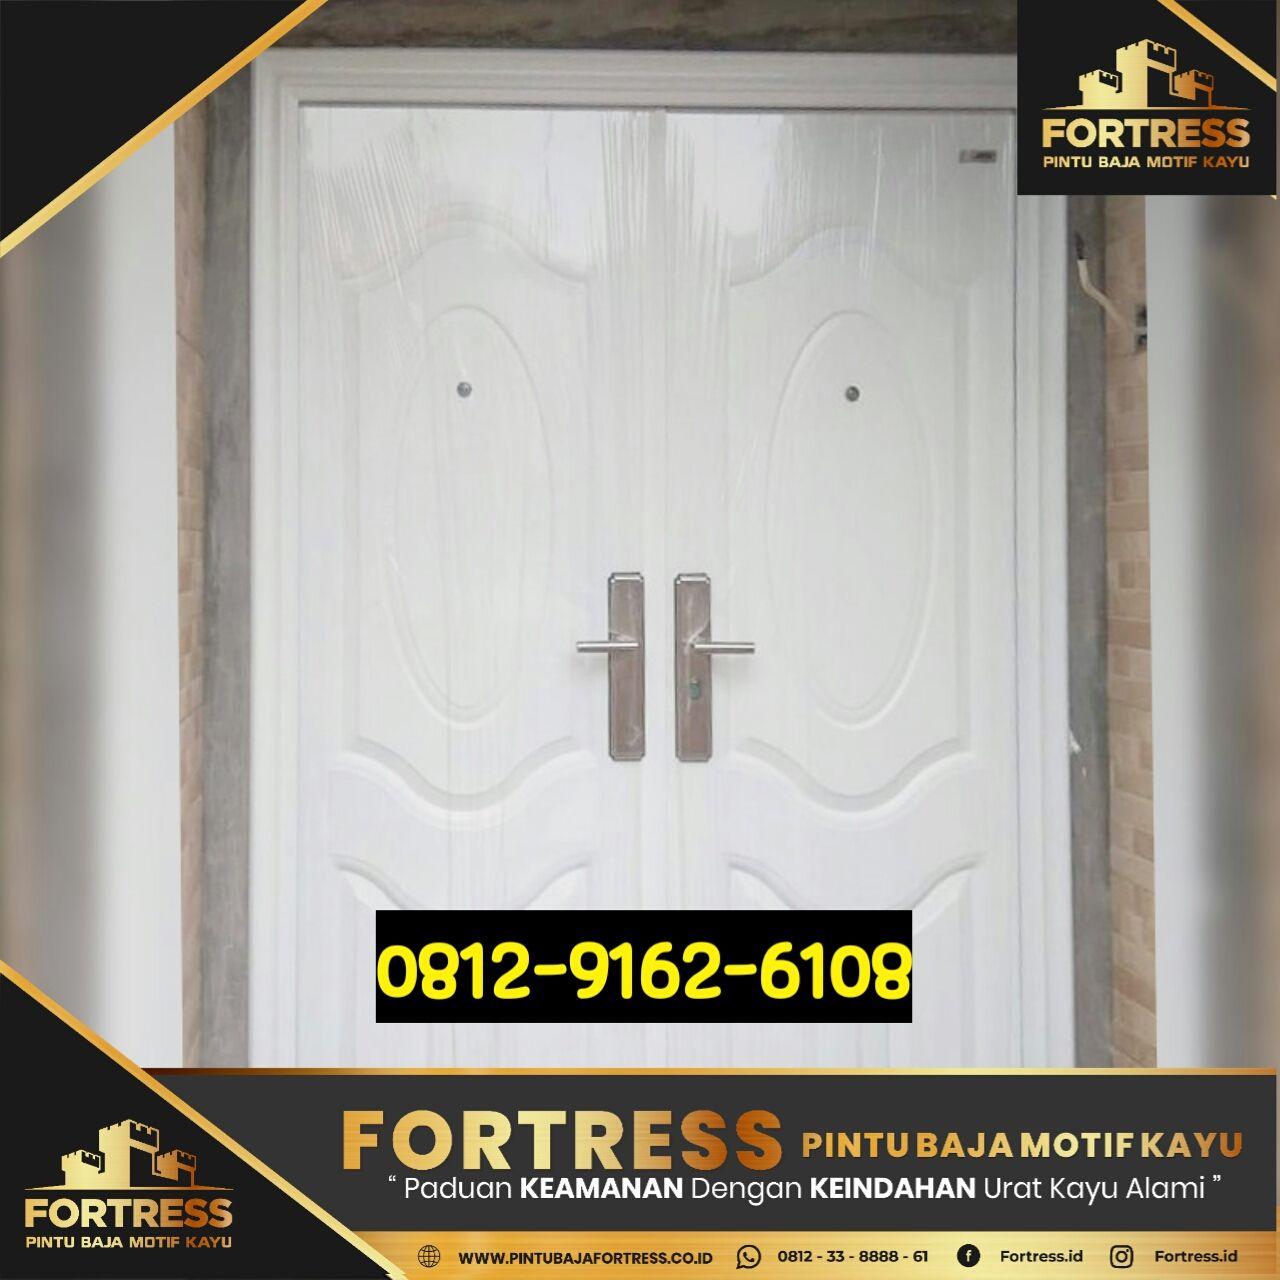 0812-9162-6105 (FOTRESS), lightweight steel door frame model, mod …